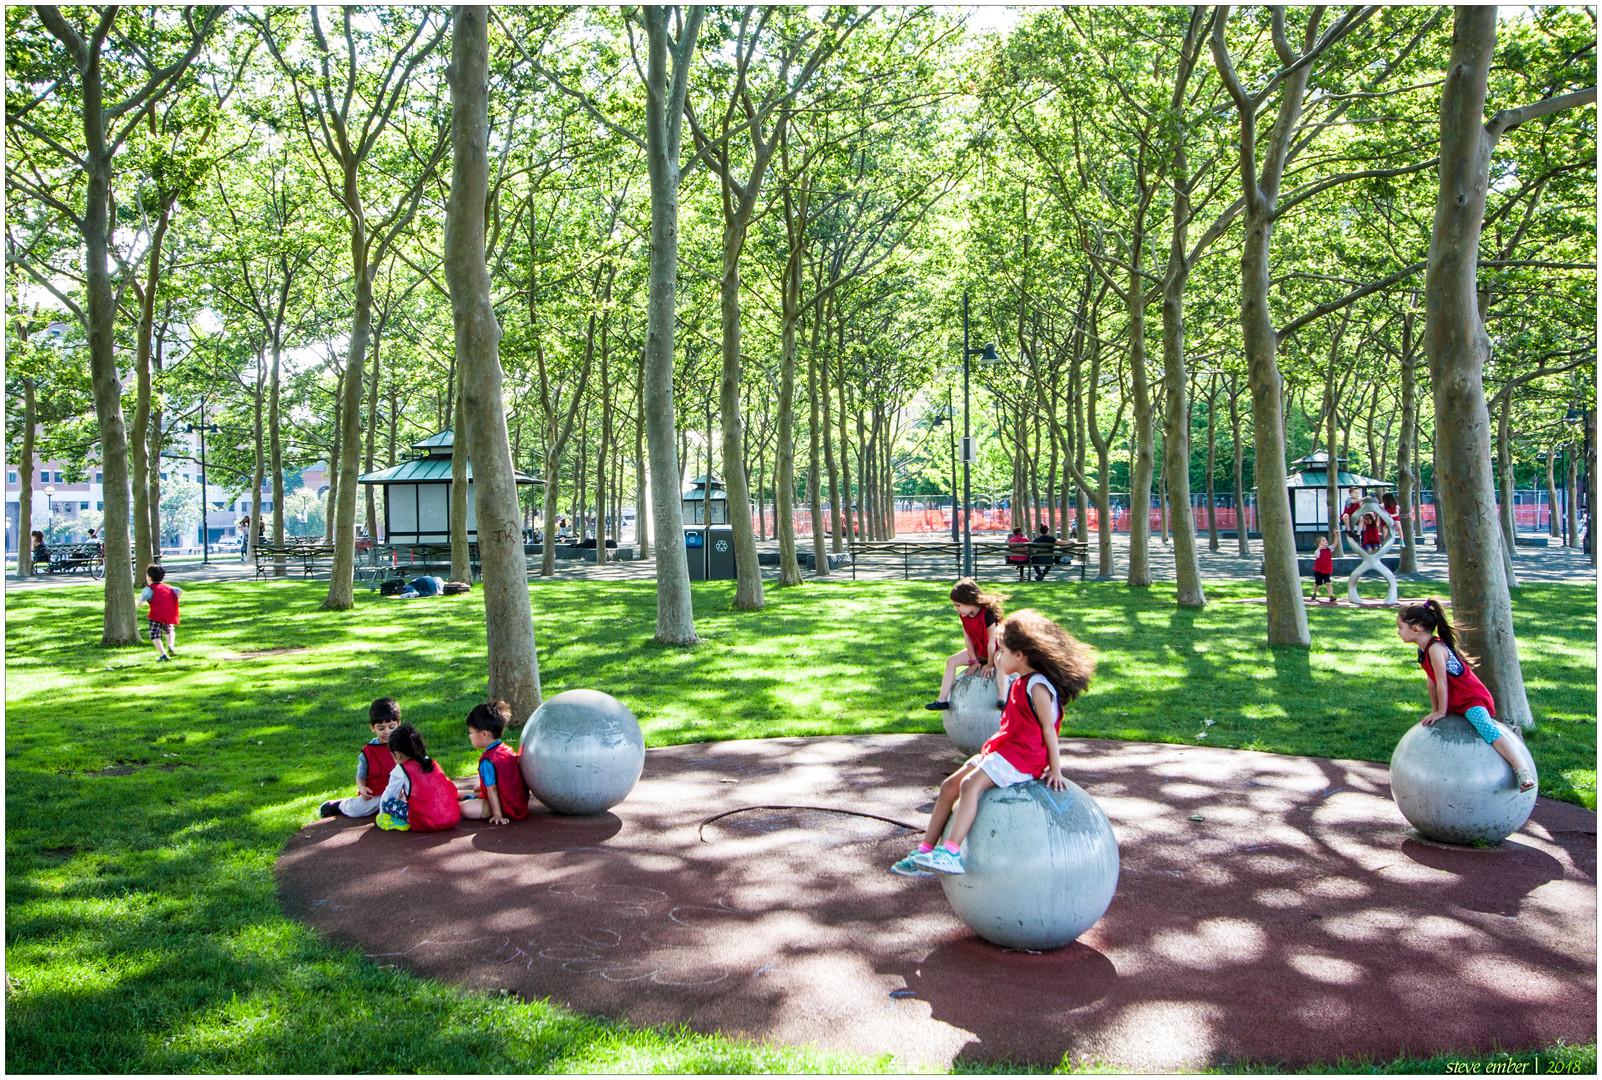 Scene in a Park - A Hoboken Impression